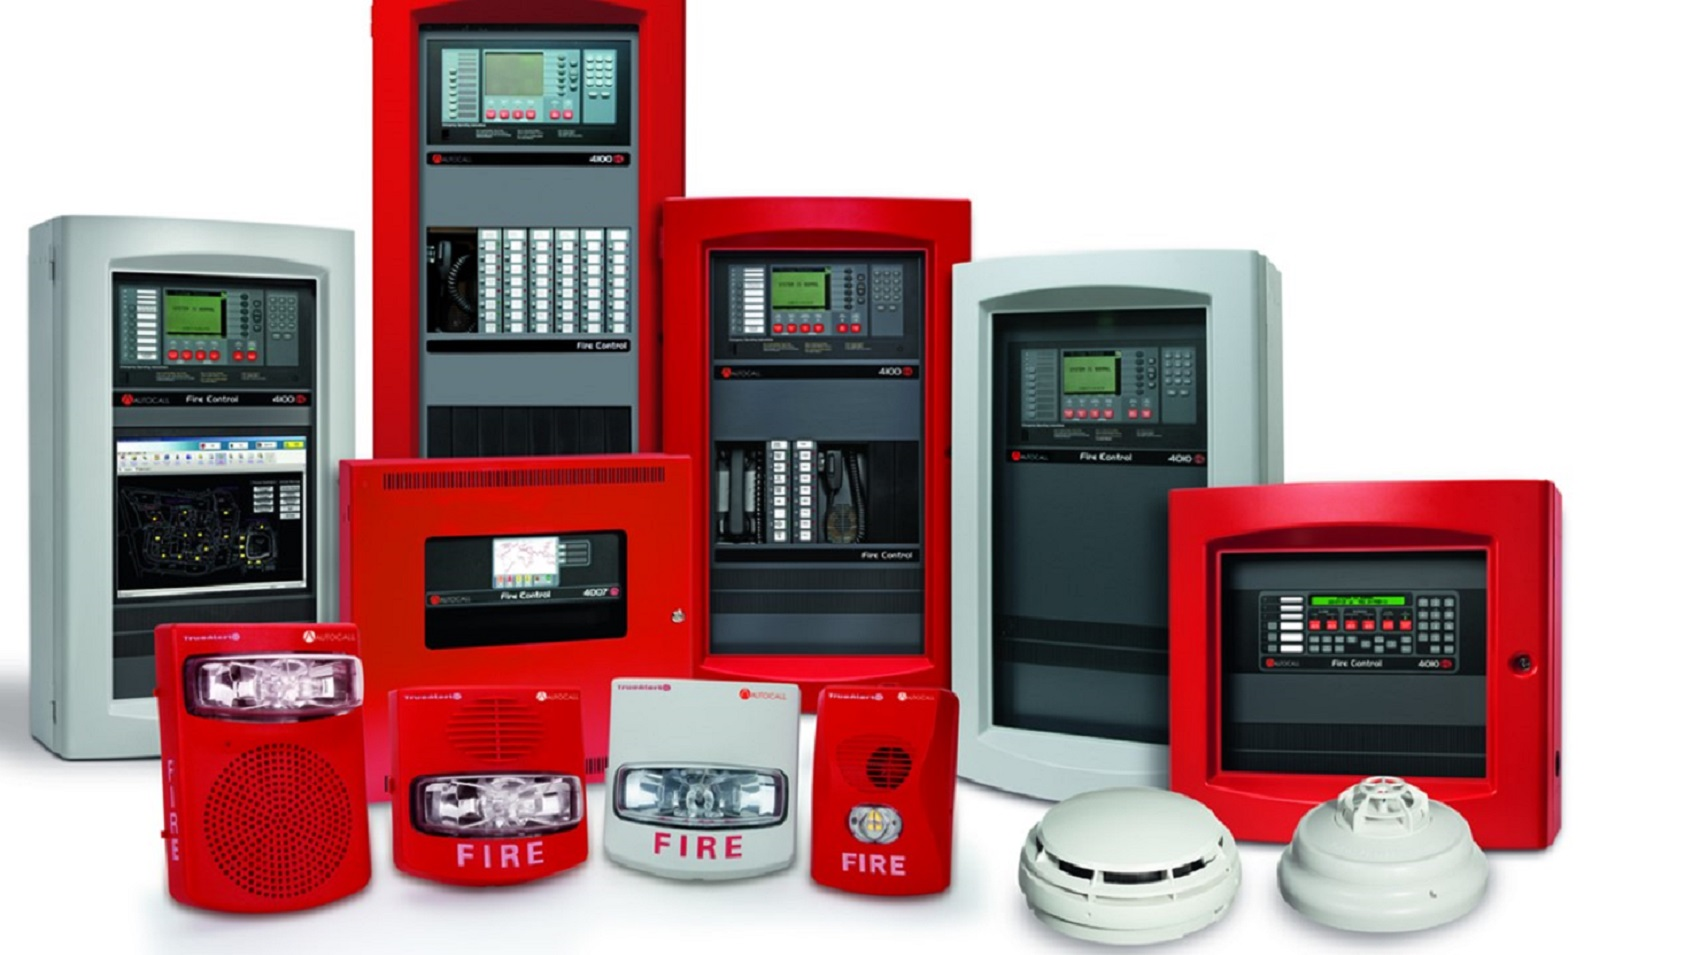 FIRE  ALARM SYSTEM MAINTENANCE TECHNICIAN